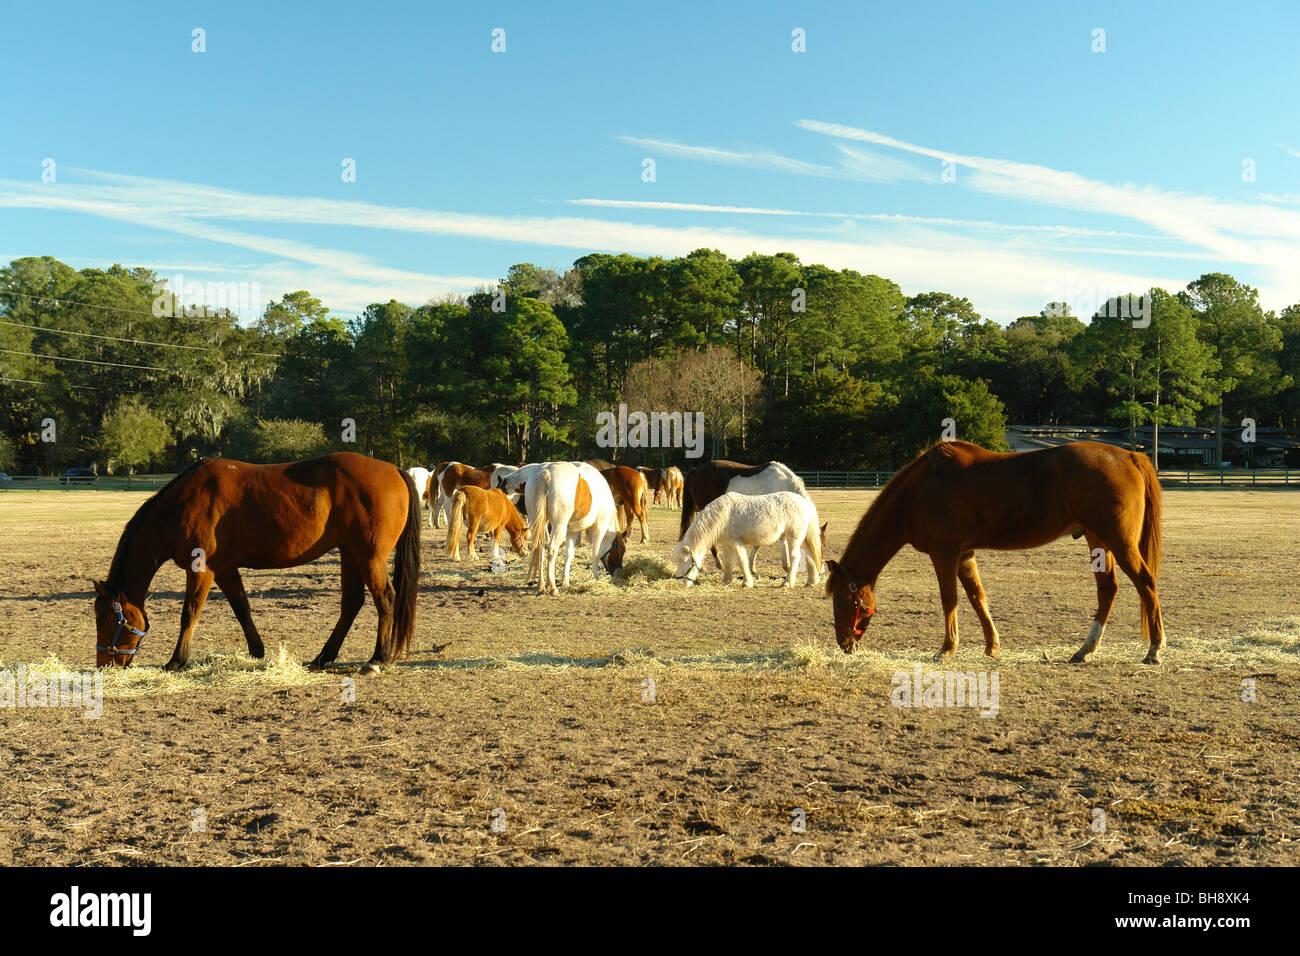 Island In South Carolina With Wild Horses